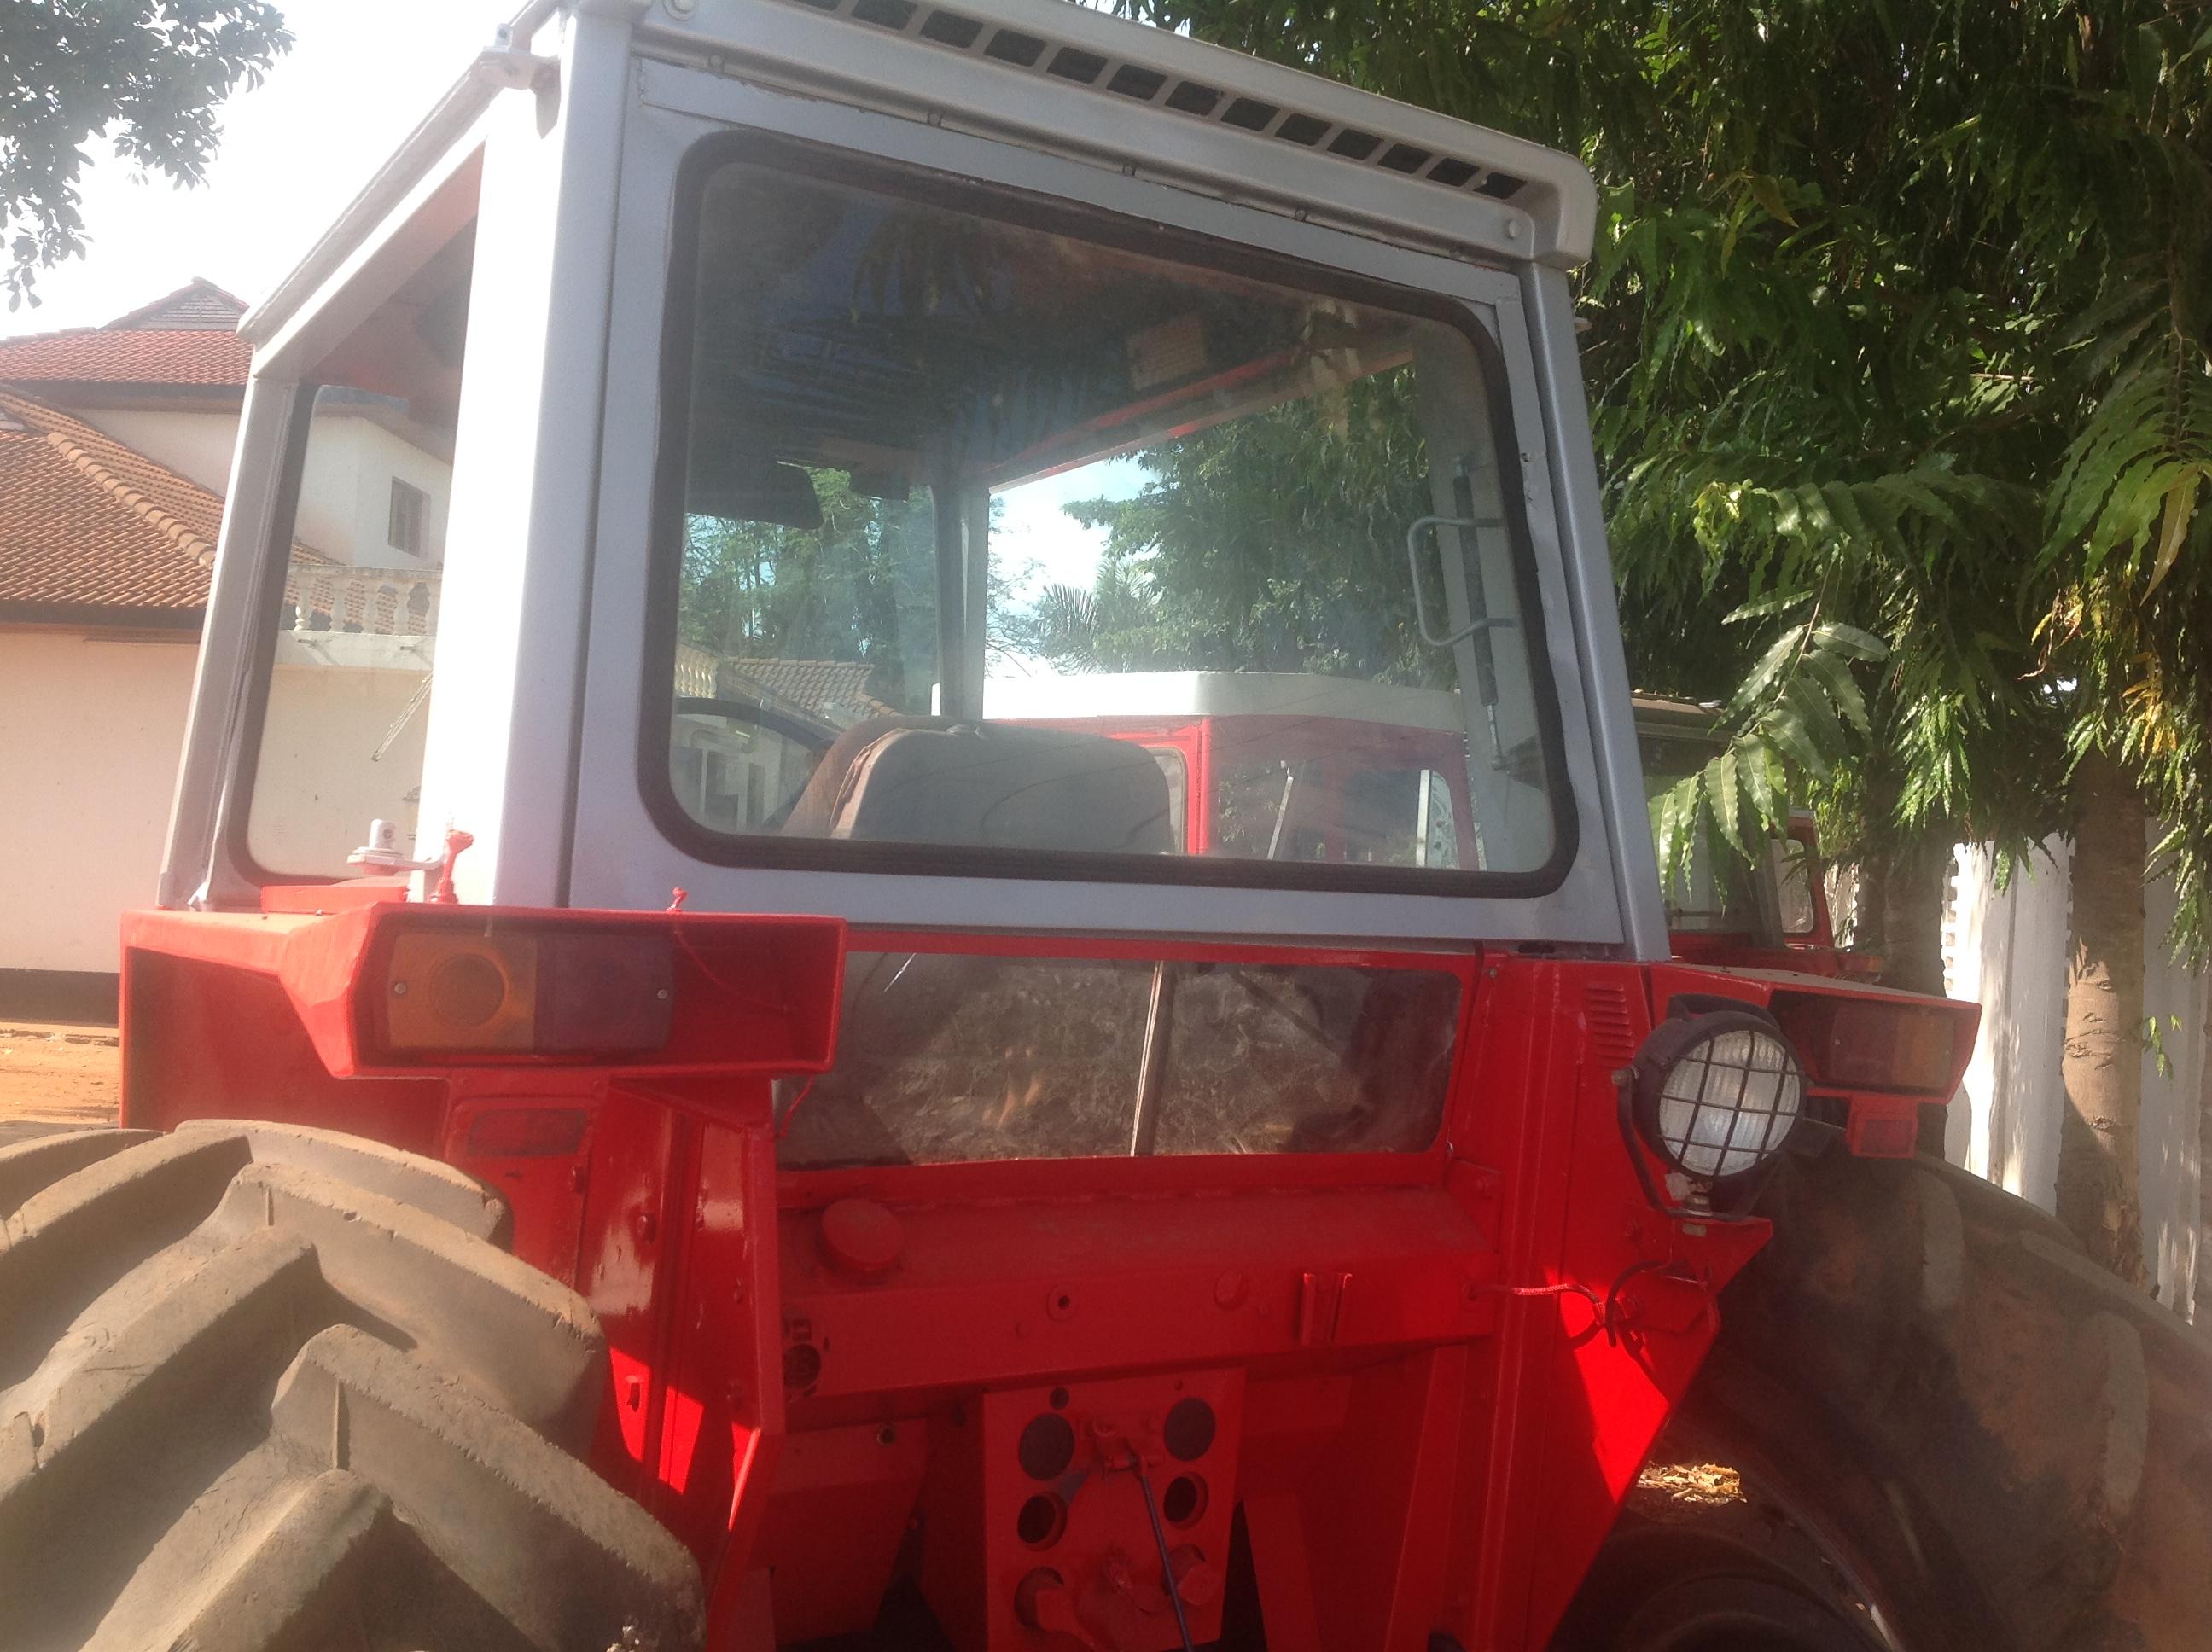 used massey ferguson 590 used tractors tanzania rh danagrisol com massey ferguson 590 workshop manual massey ferguson 590 service manual